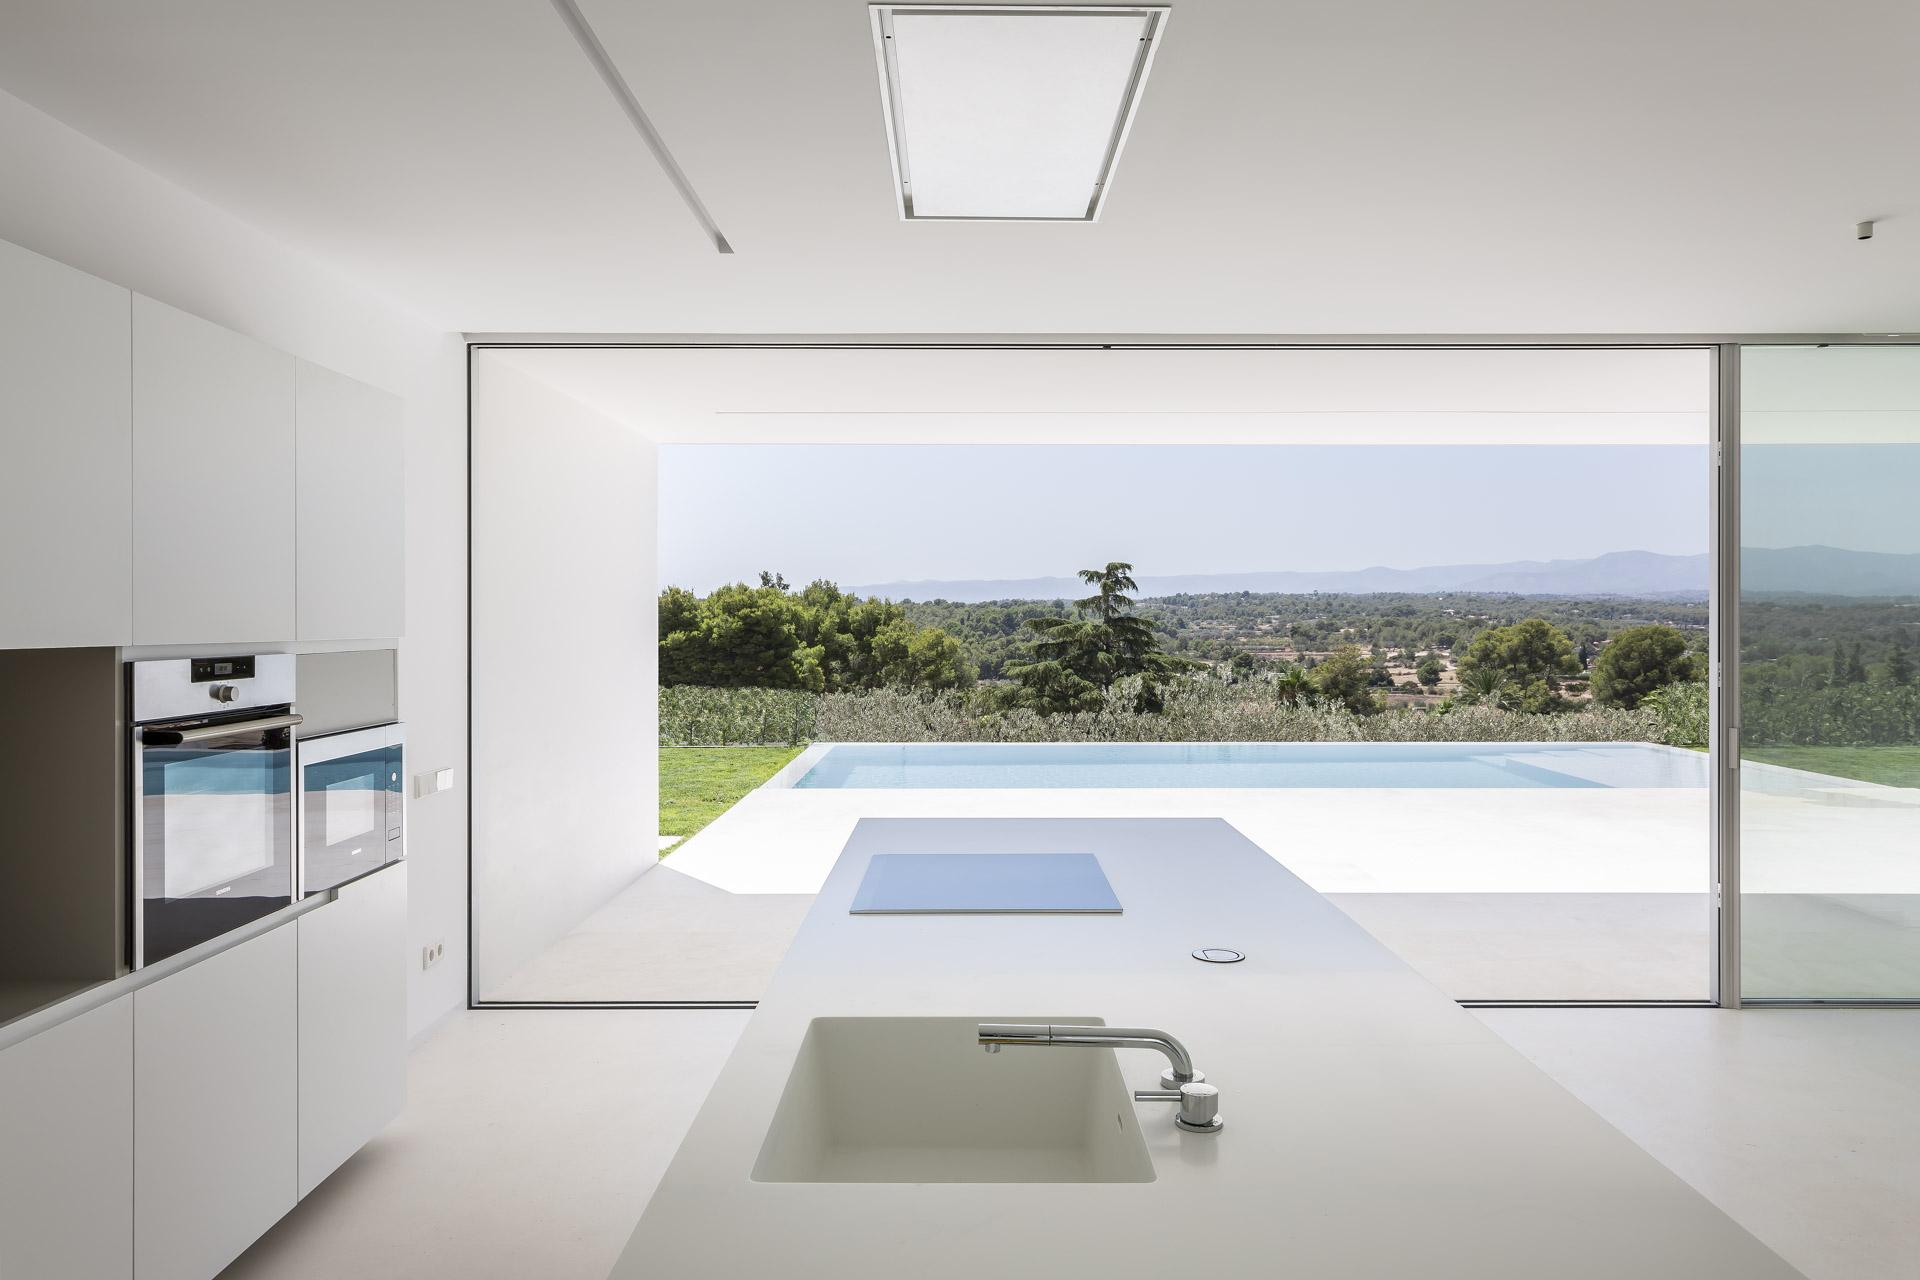 fotografia-arquitectura-valencia-german-cabo-gallardo-llopis-villamarchante-vivienda-22